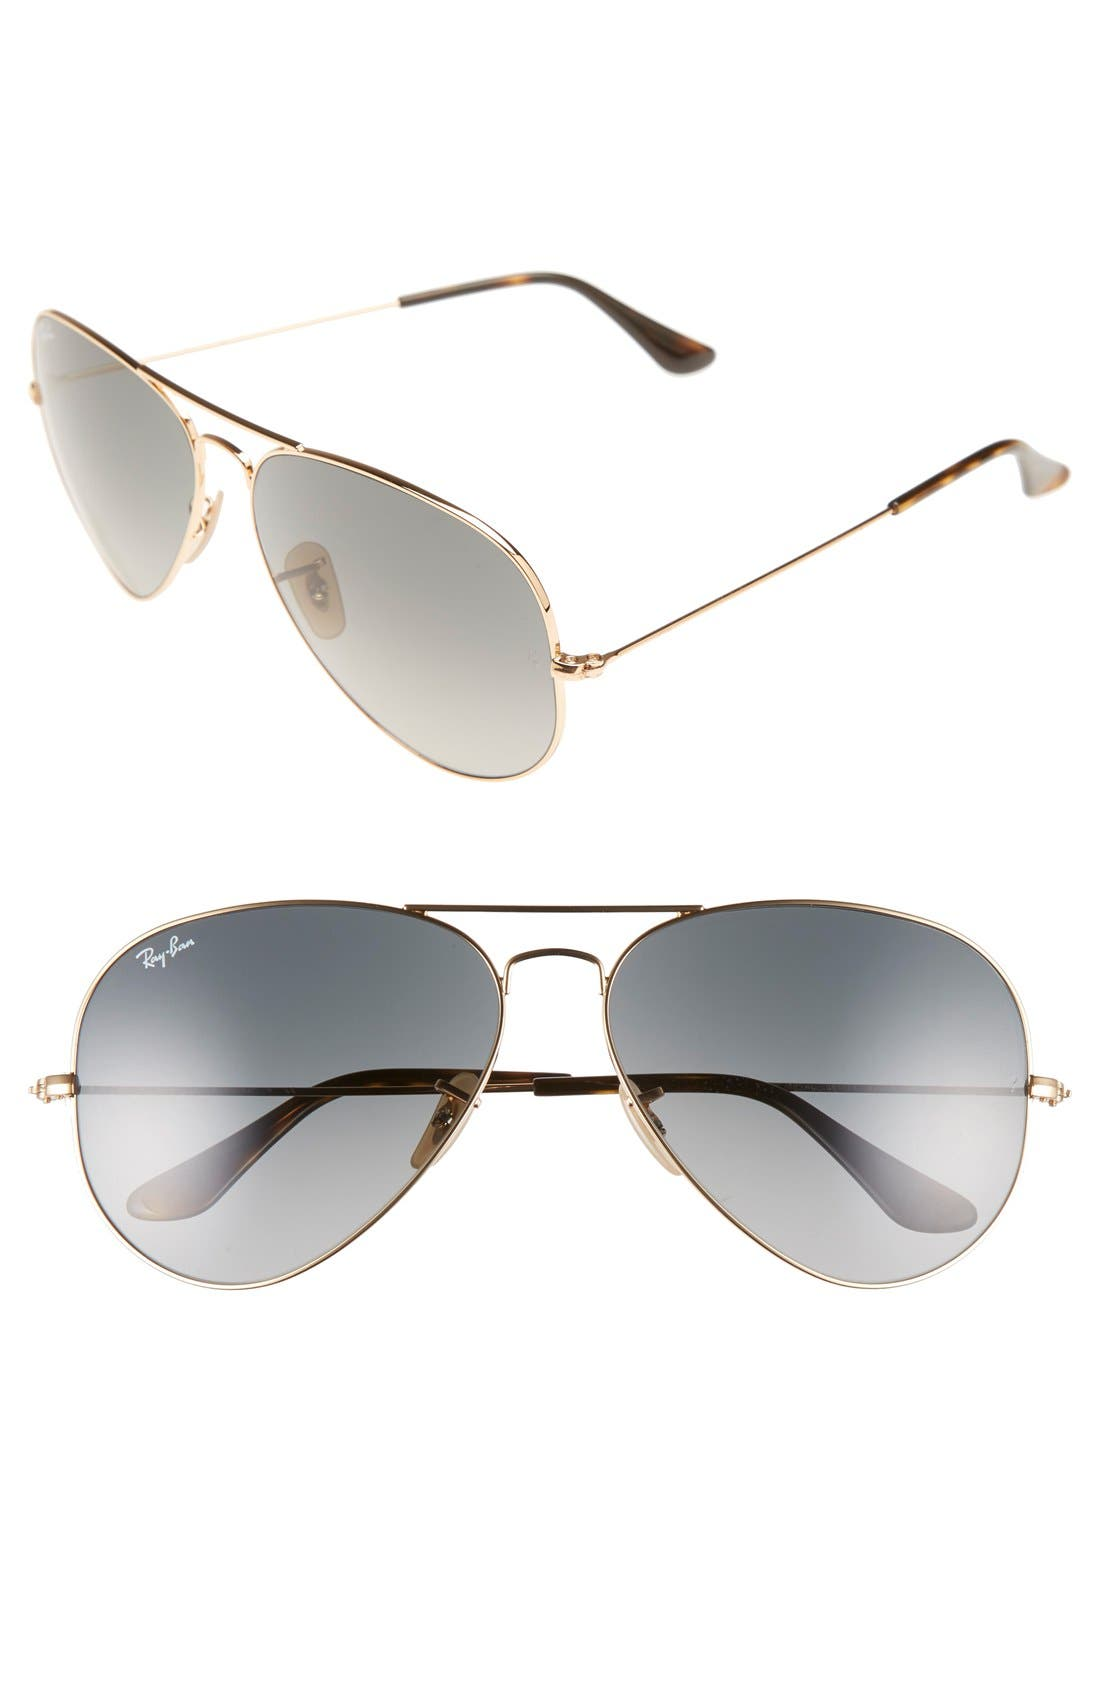 RAY-BAN 'Org Aviator' 62mm Sunglasses, Main, color, GOLD/ GREY GRADIENT